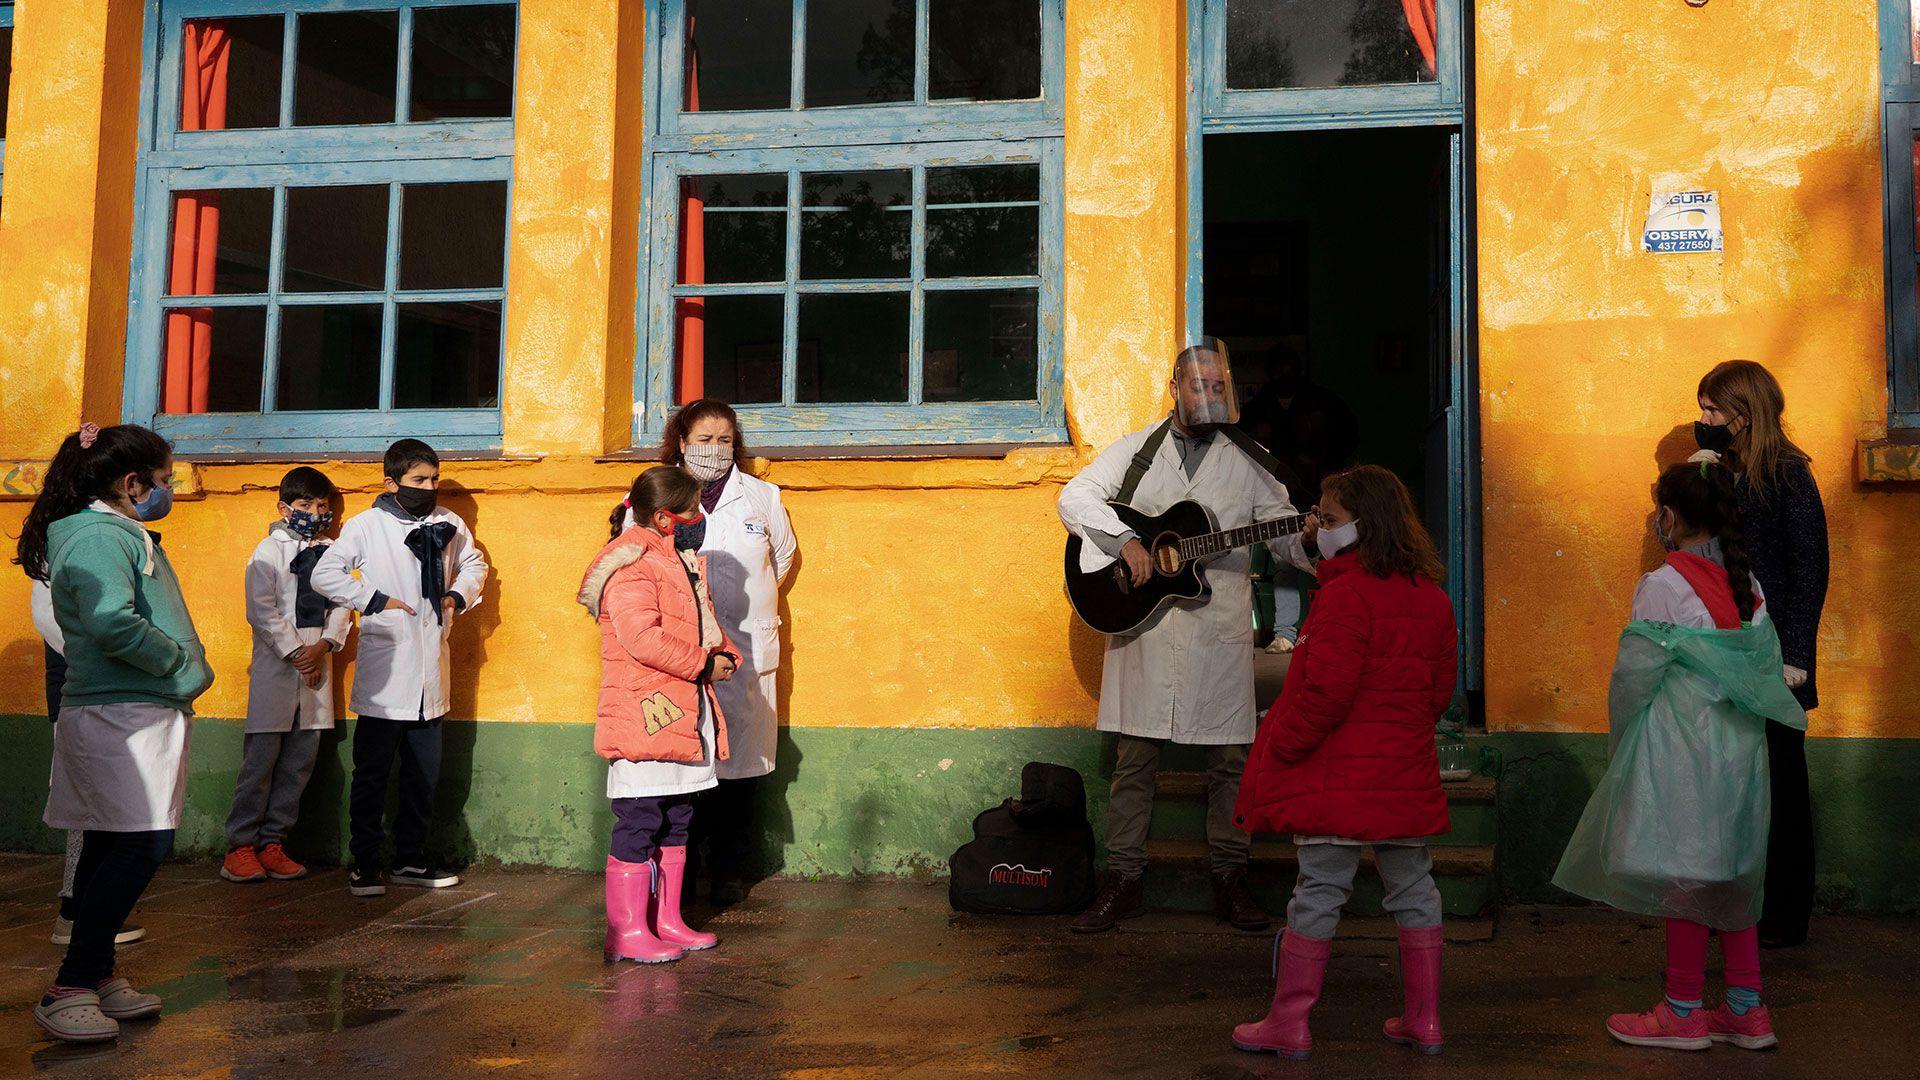 Vuelta a clases en Uruguay